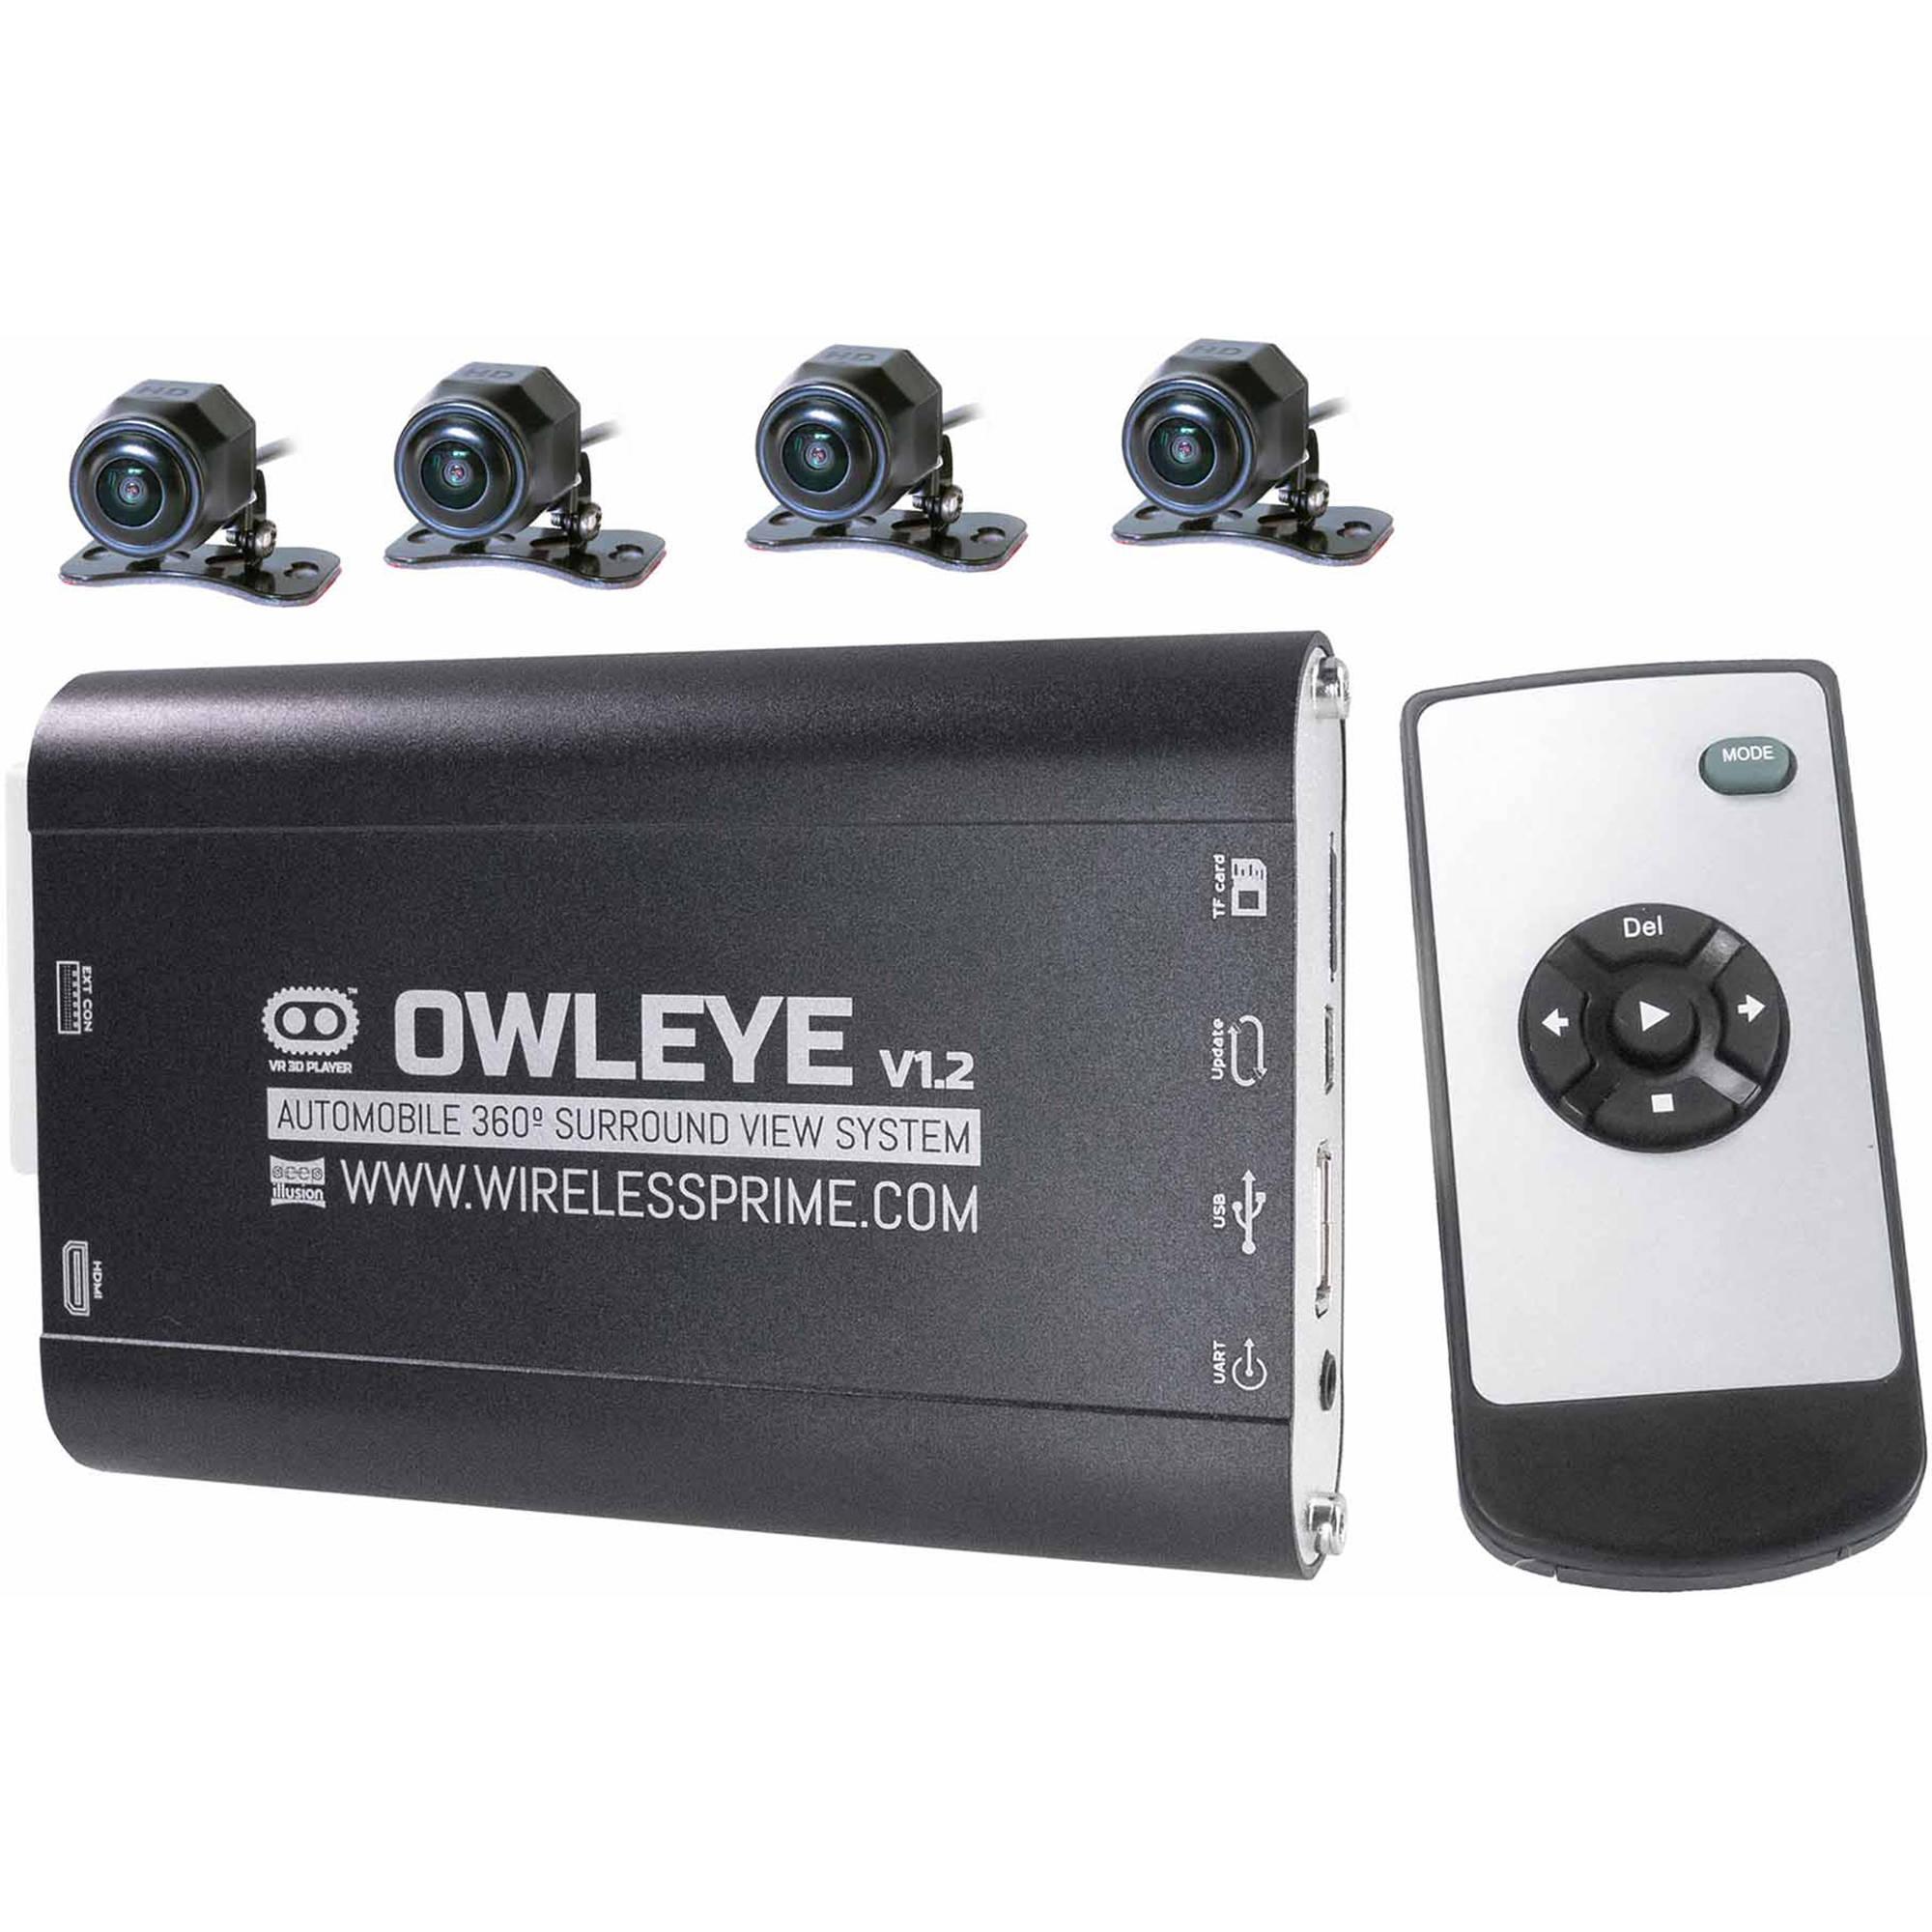 Https C Product 1307101 Reg Fujifilm Mirrorless Camera X T20 1650 Bk Cinegears 5 502 Owleye Automobile Vr 360 1400449